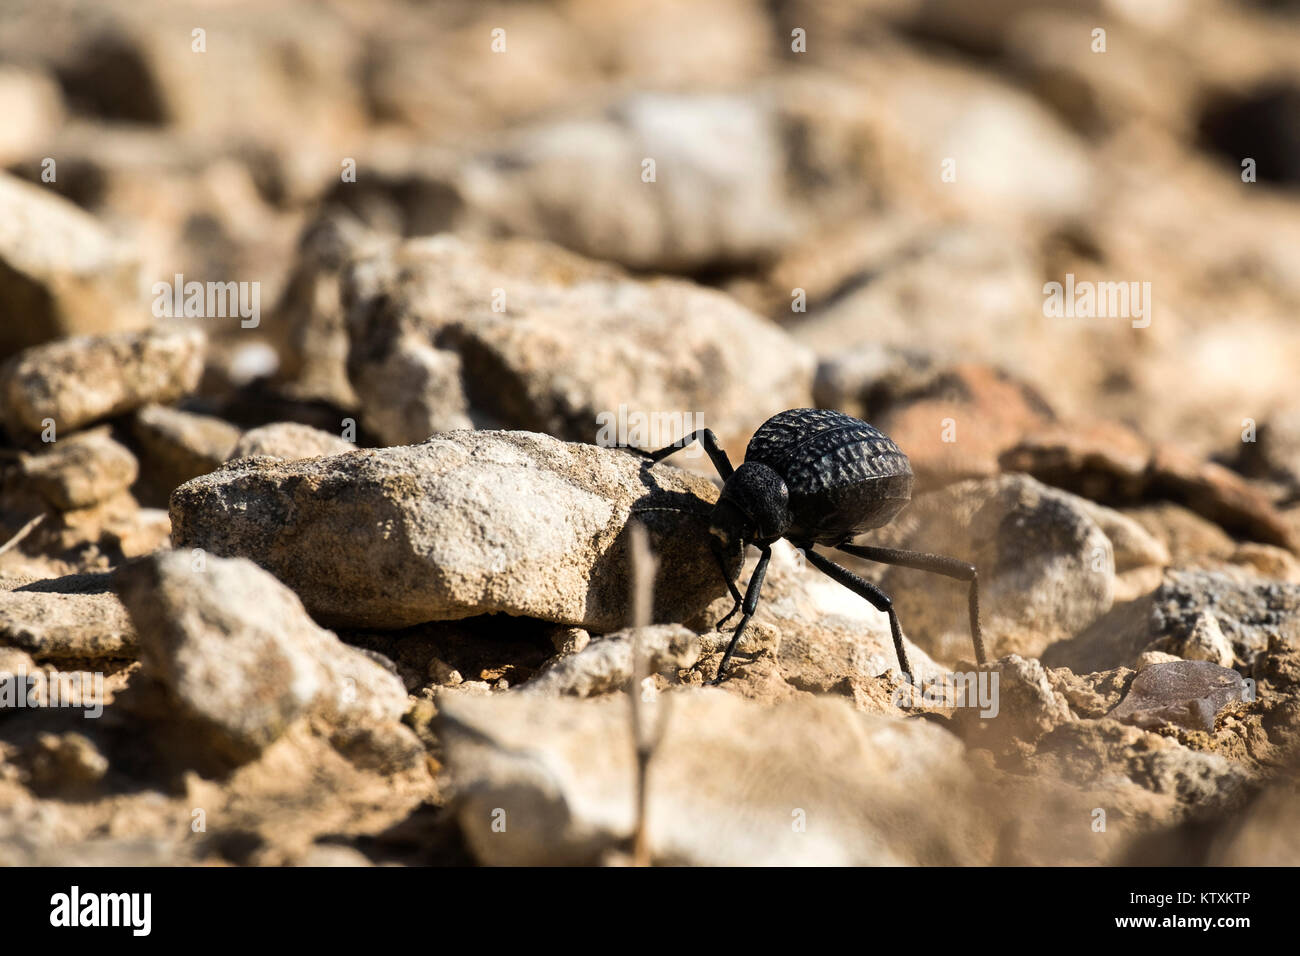 Beetle from the family of darkling beetles crawls on stones (Pimelia bipunctata) - Stock Image